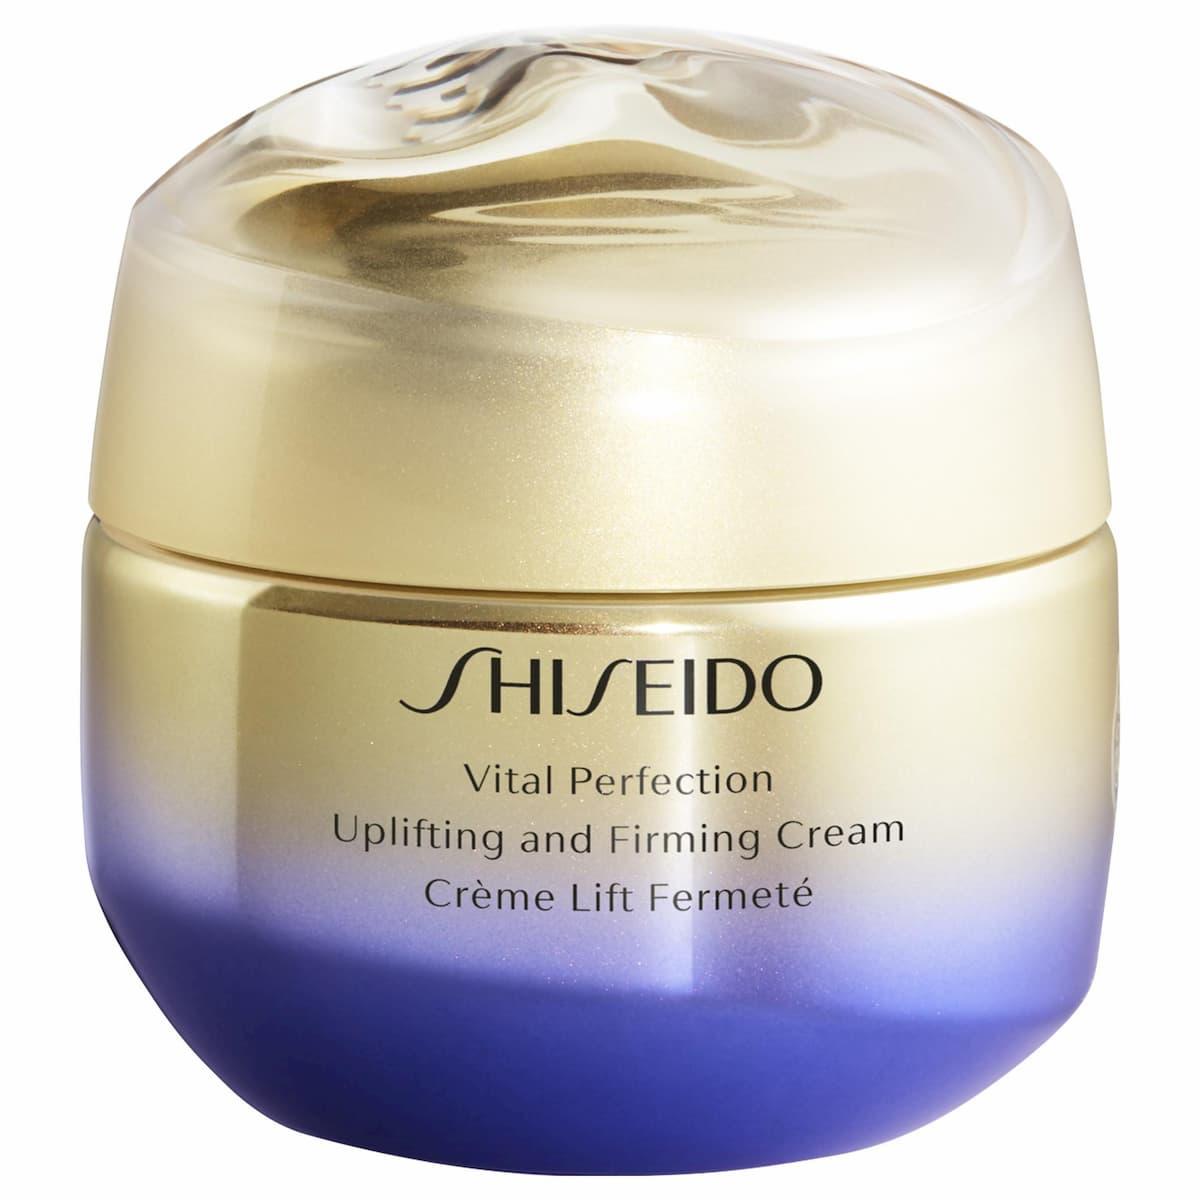 Vital Perfection Crème Lift Fermeté - Shiseido